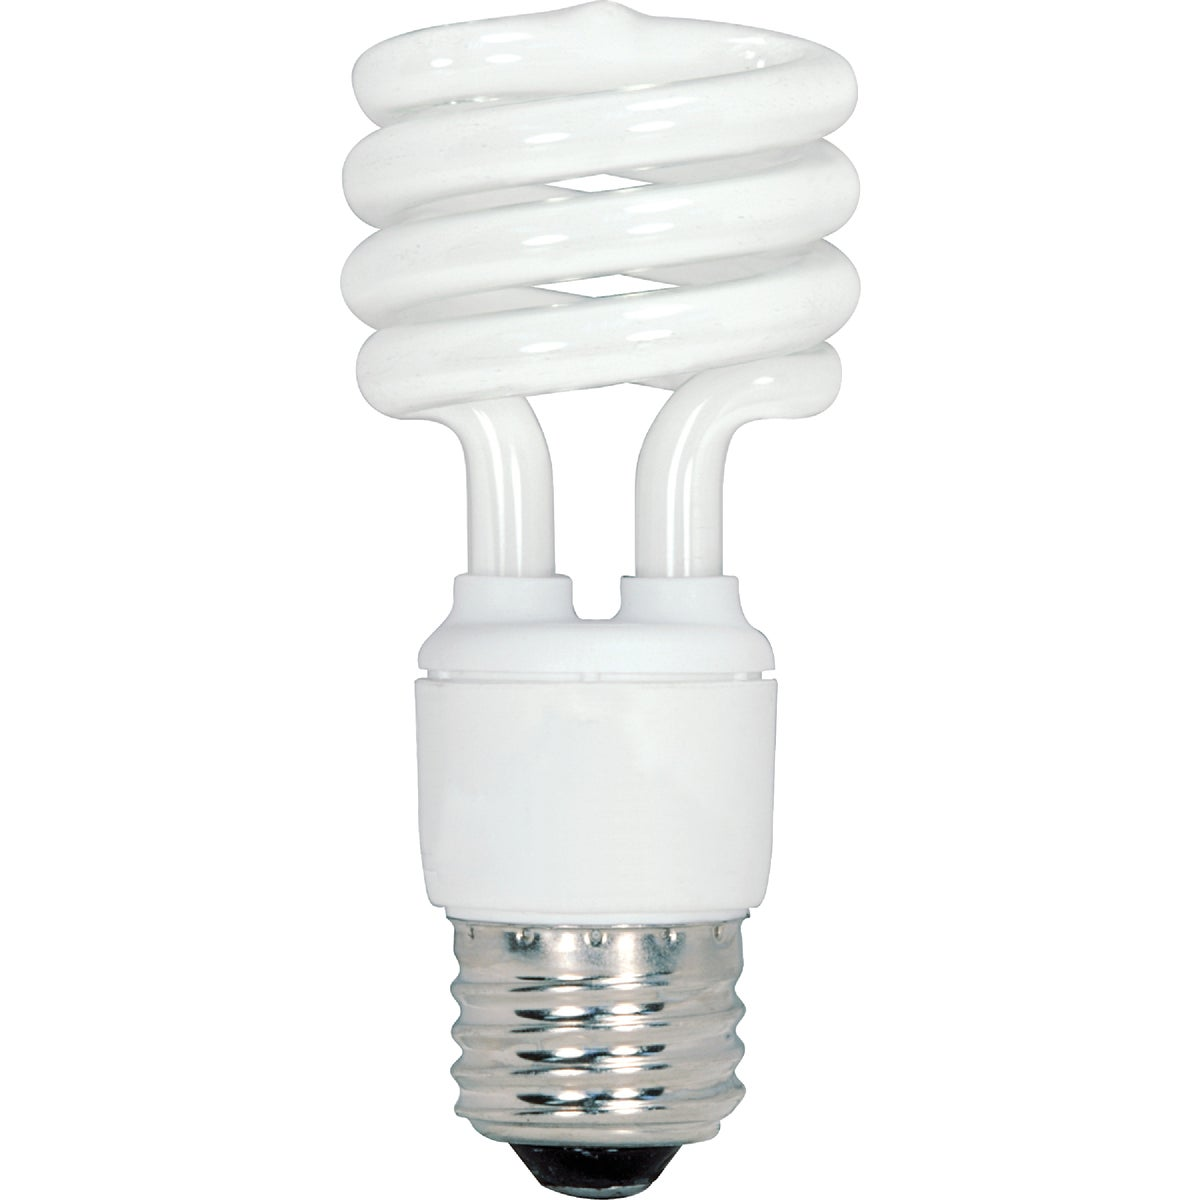 GE Lighting 5PK 13W CFL BULB 85939 FLE13HT3/2/SW/5PK